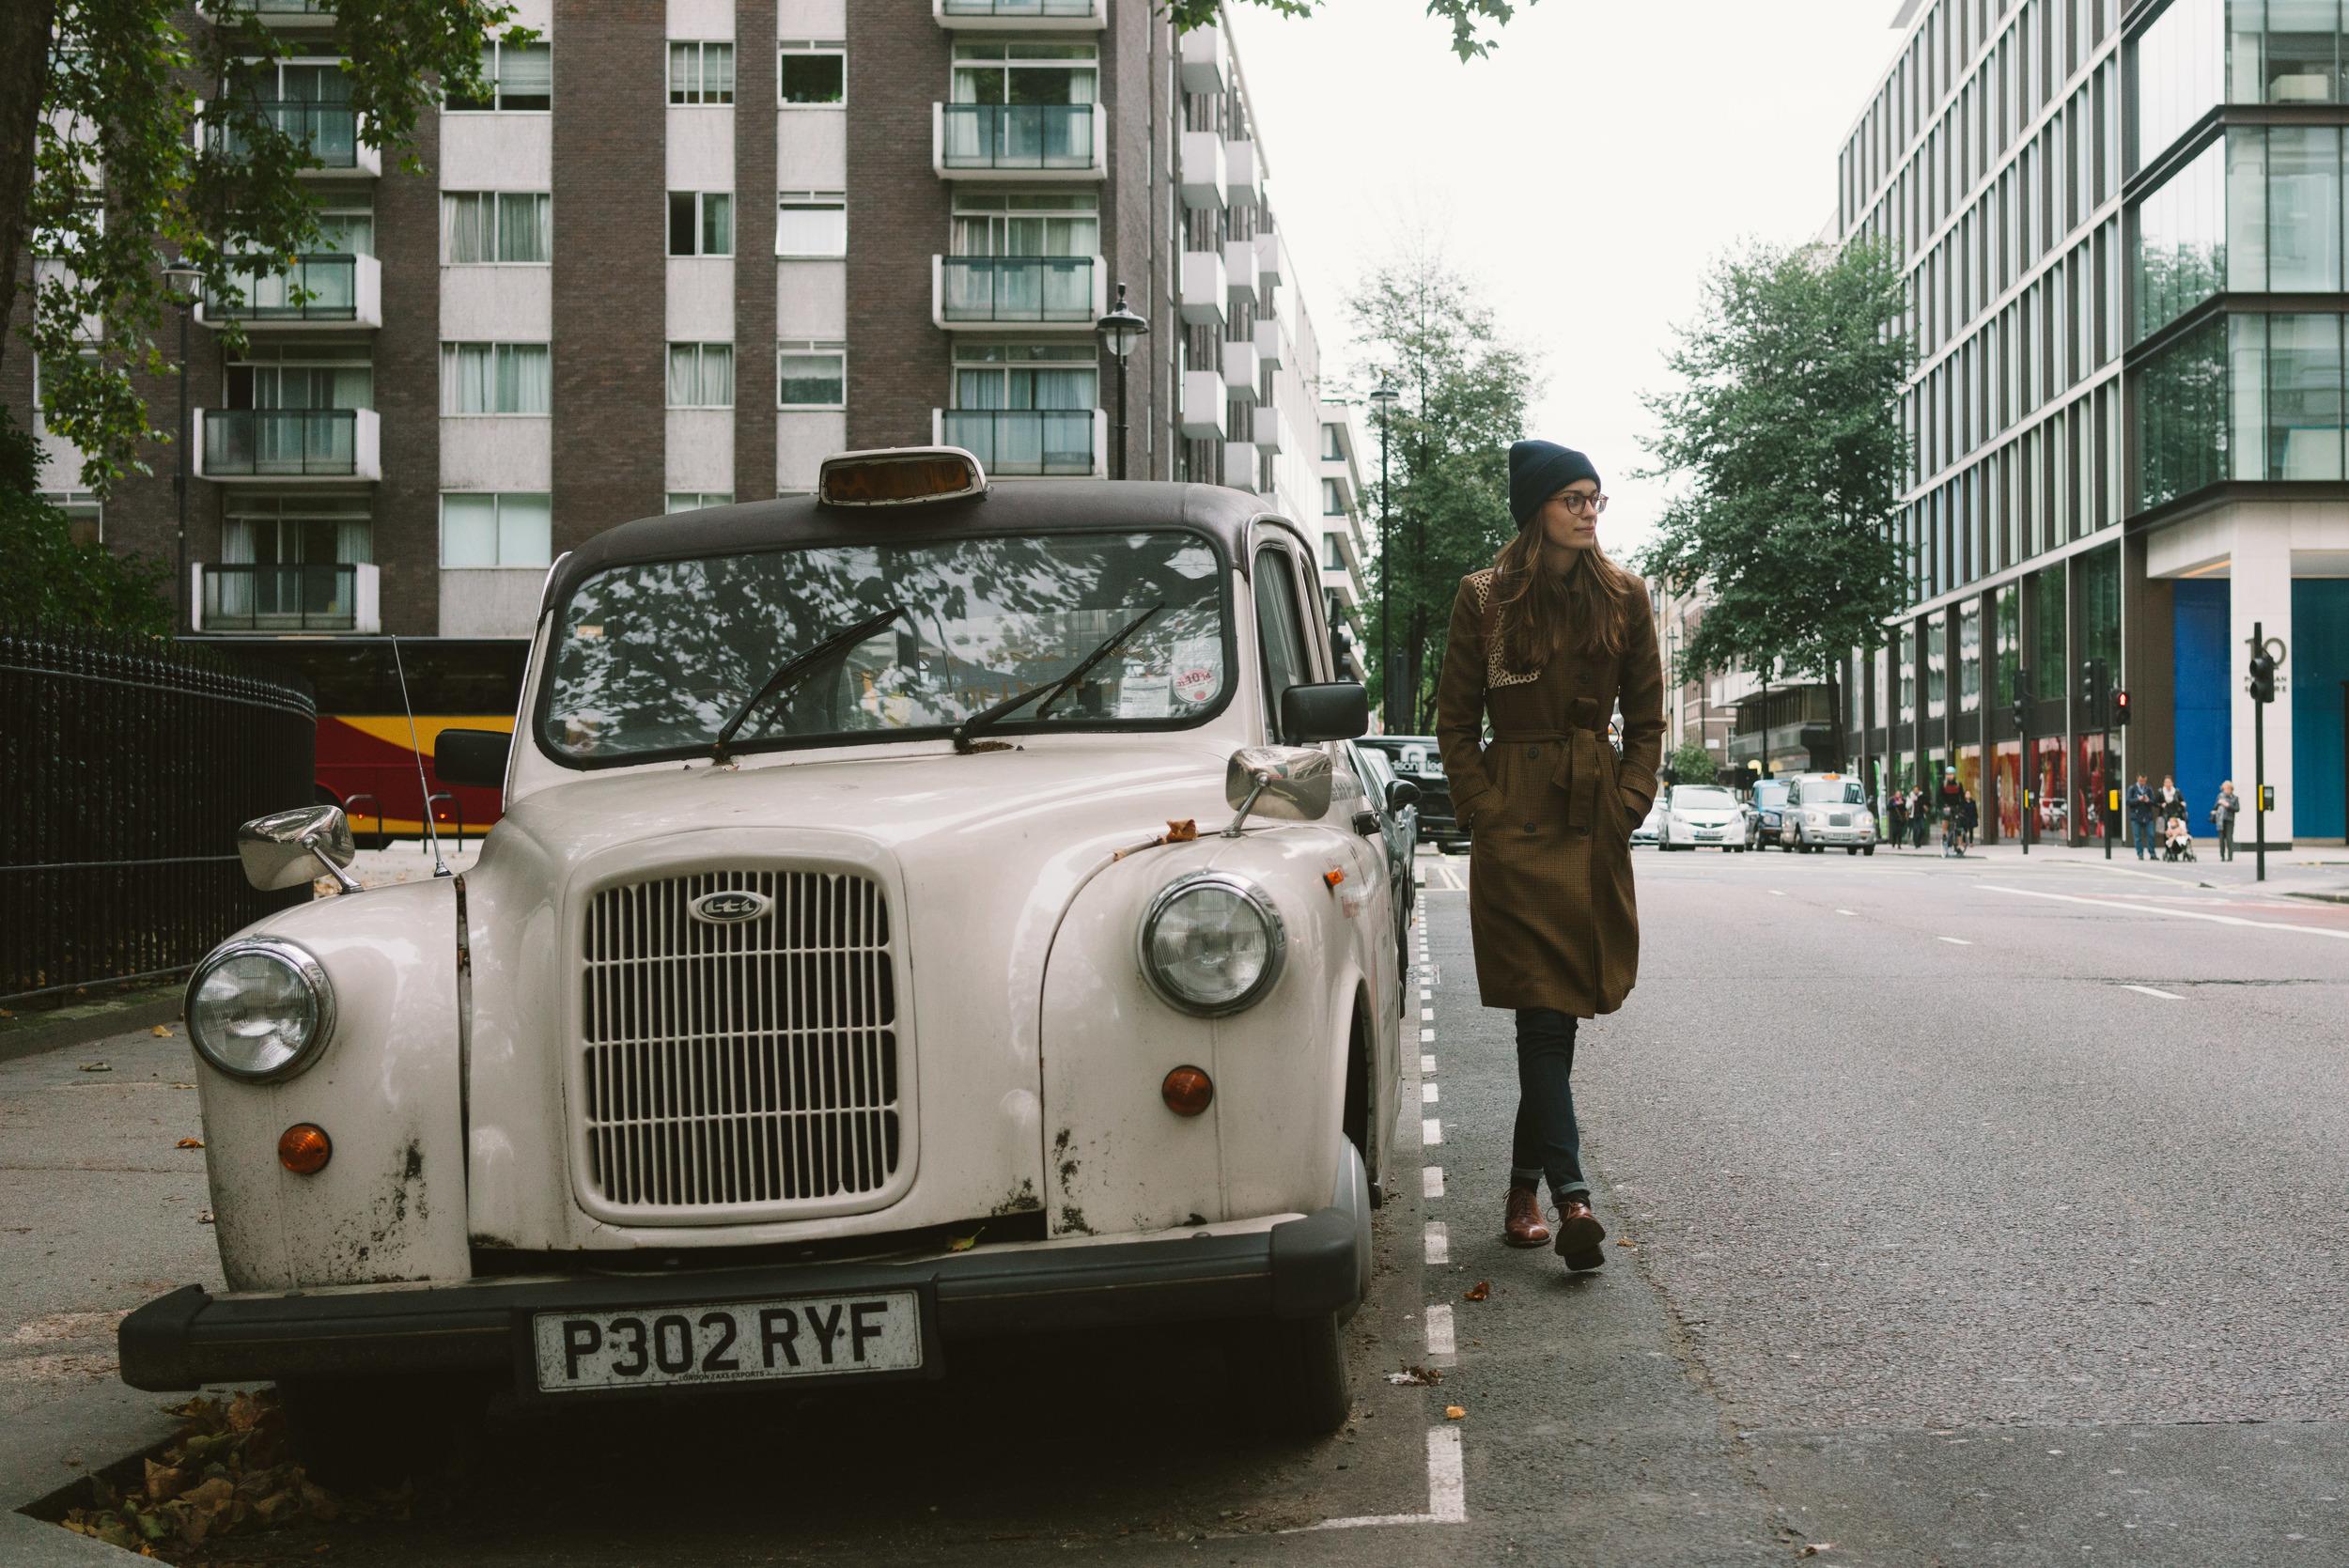 londonDay3-7.jpg